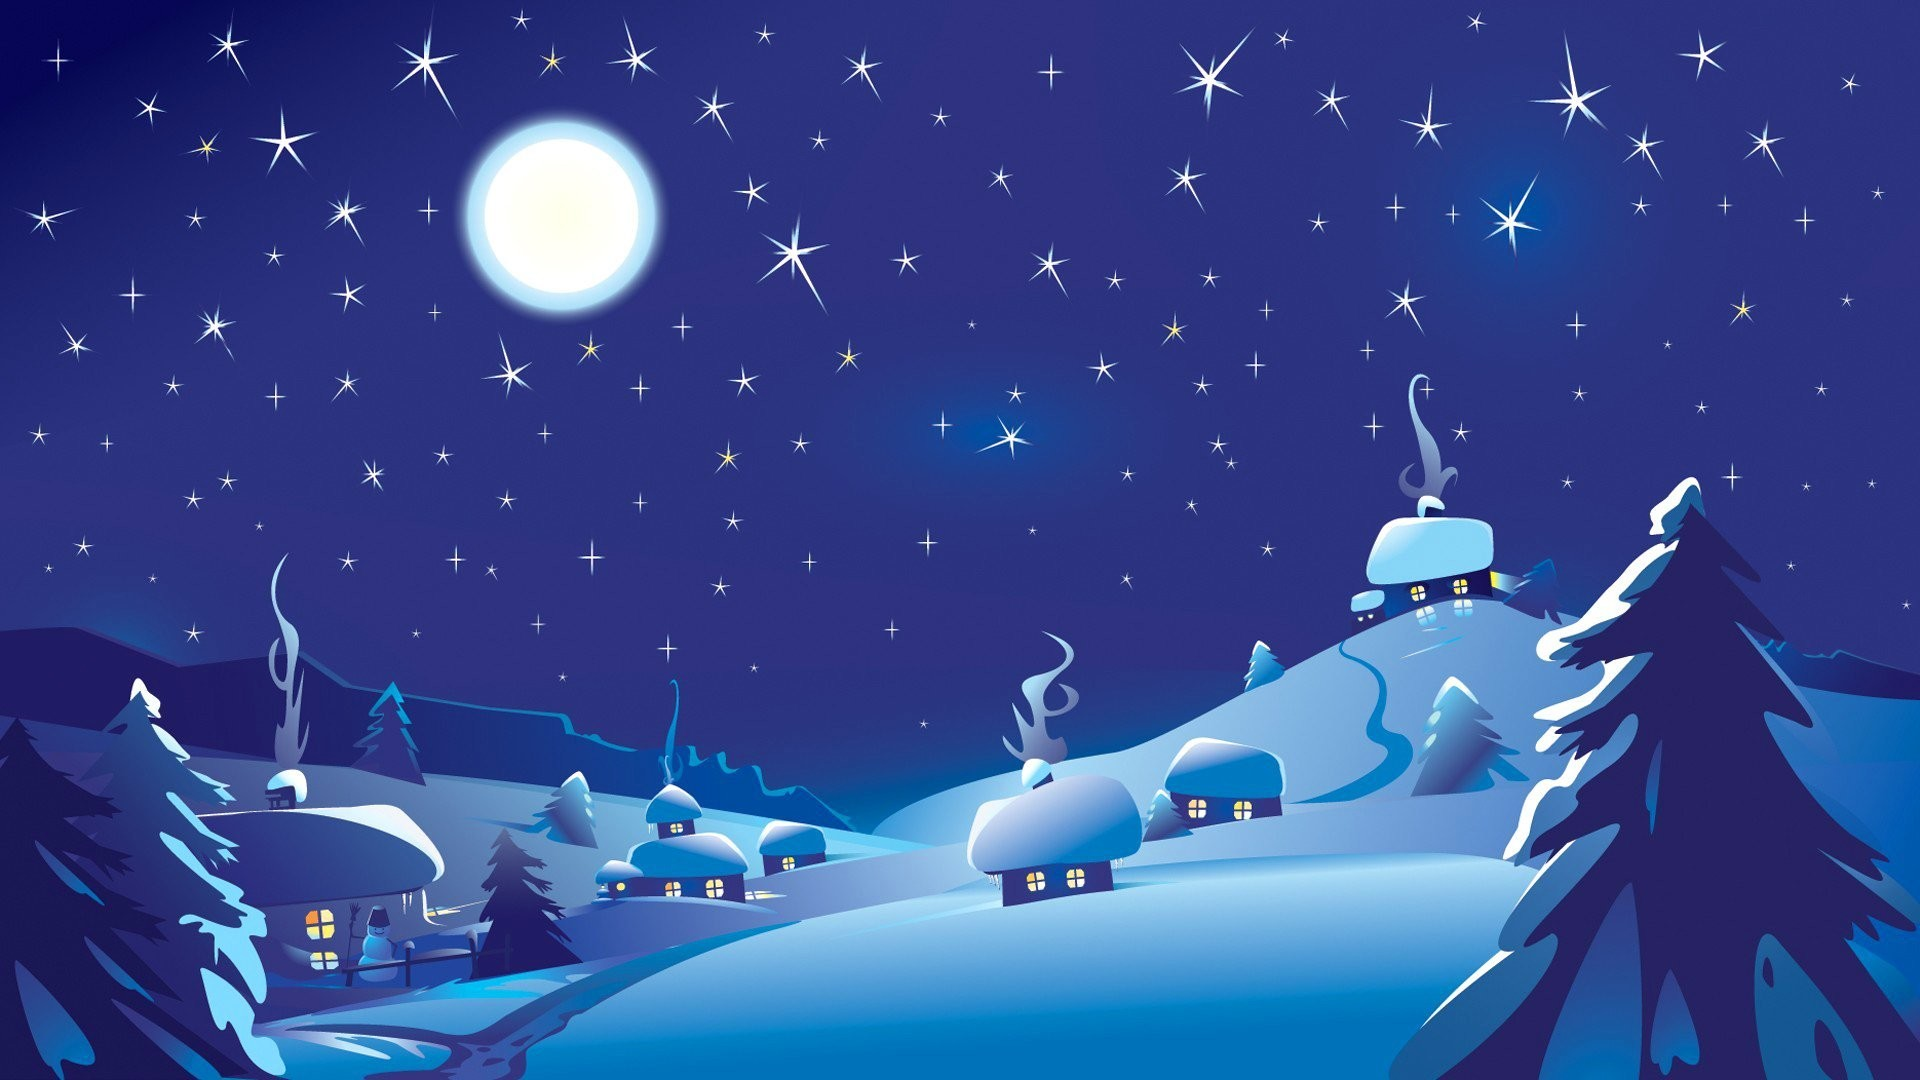 landscape winter night sky moon star hata snowman